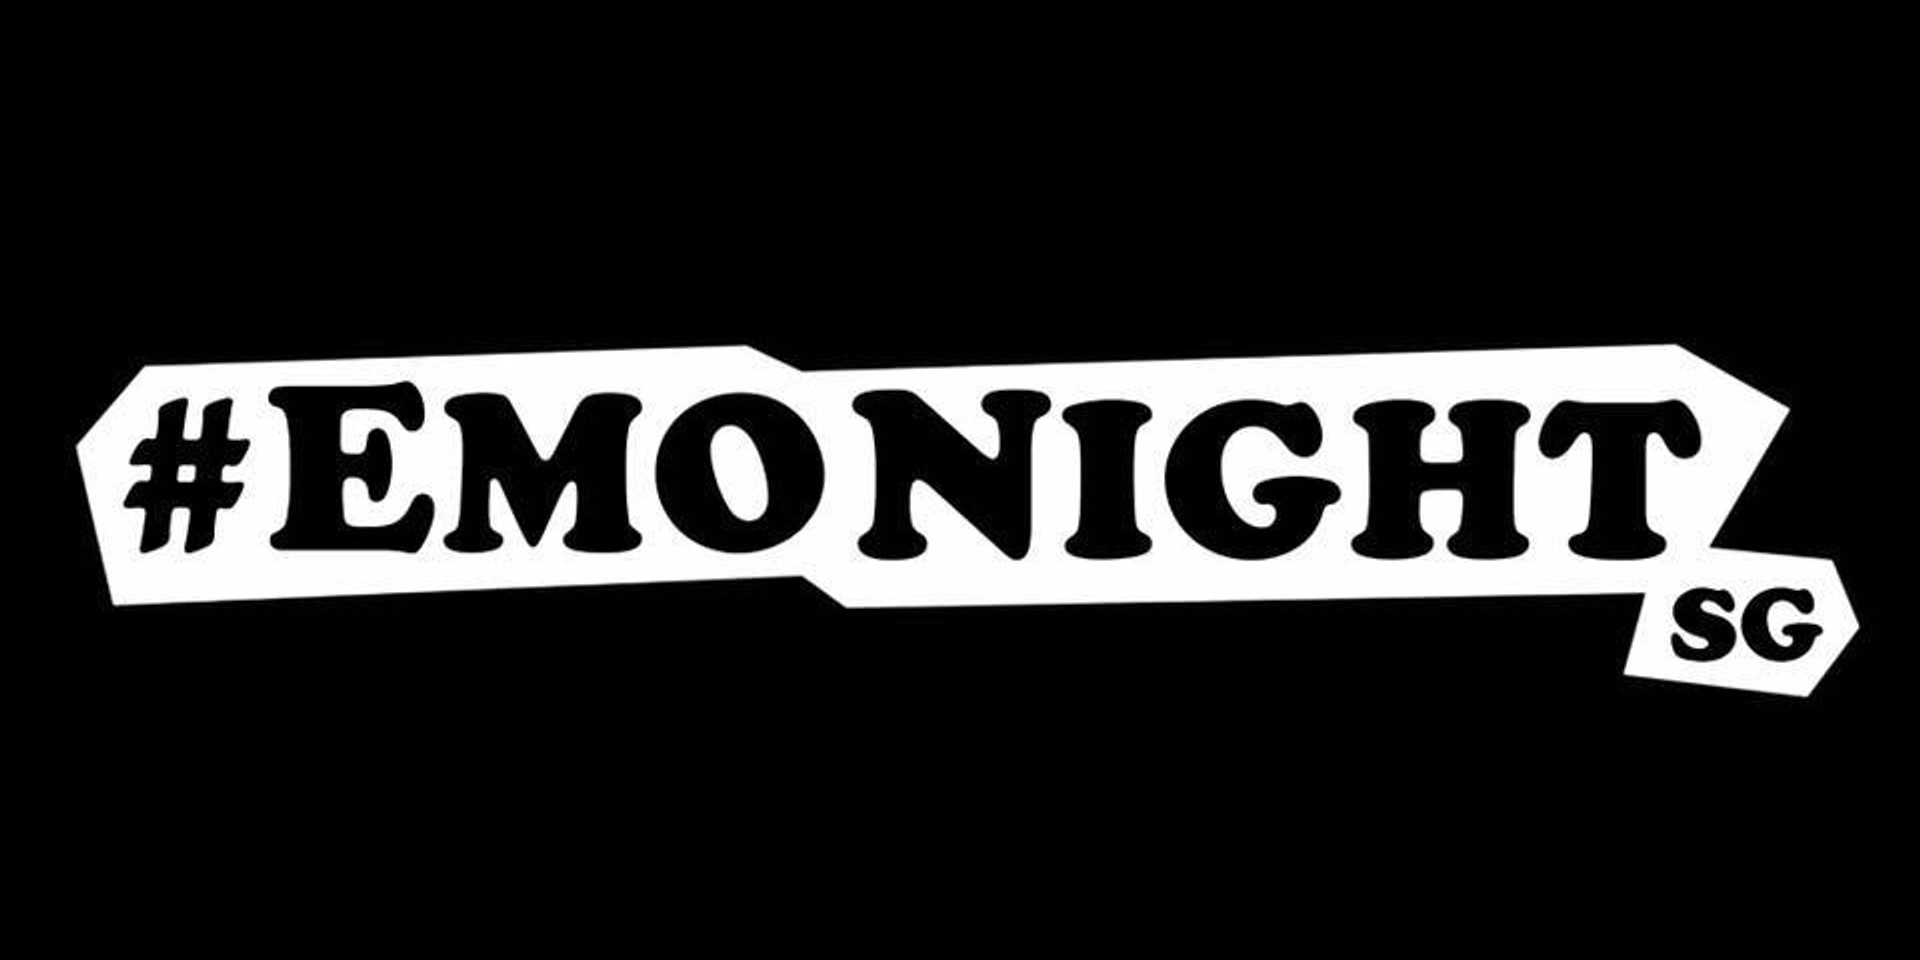 EMONIGHTSG to perform in Leeds, U.K. this month